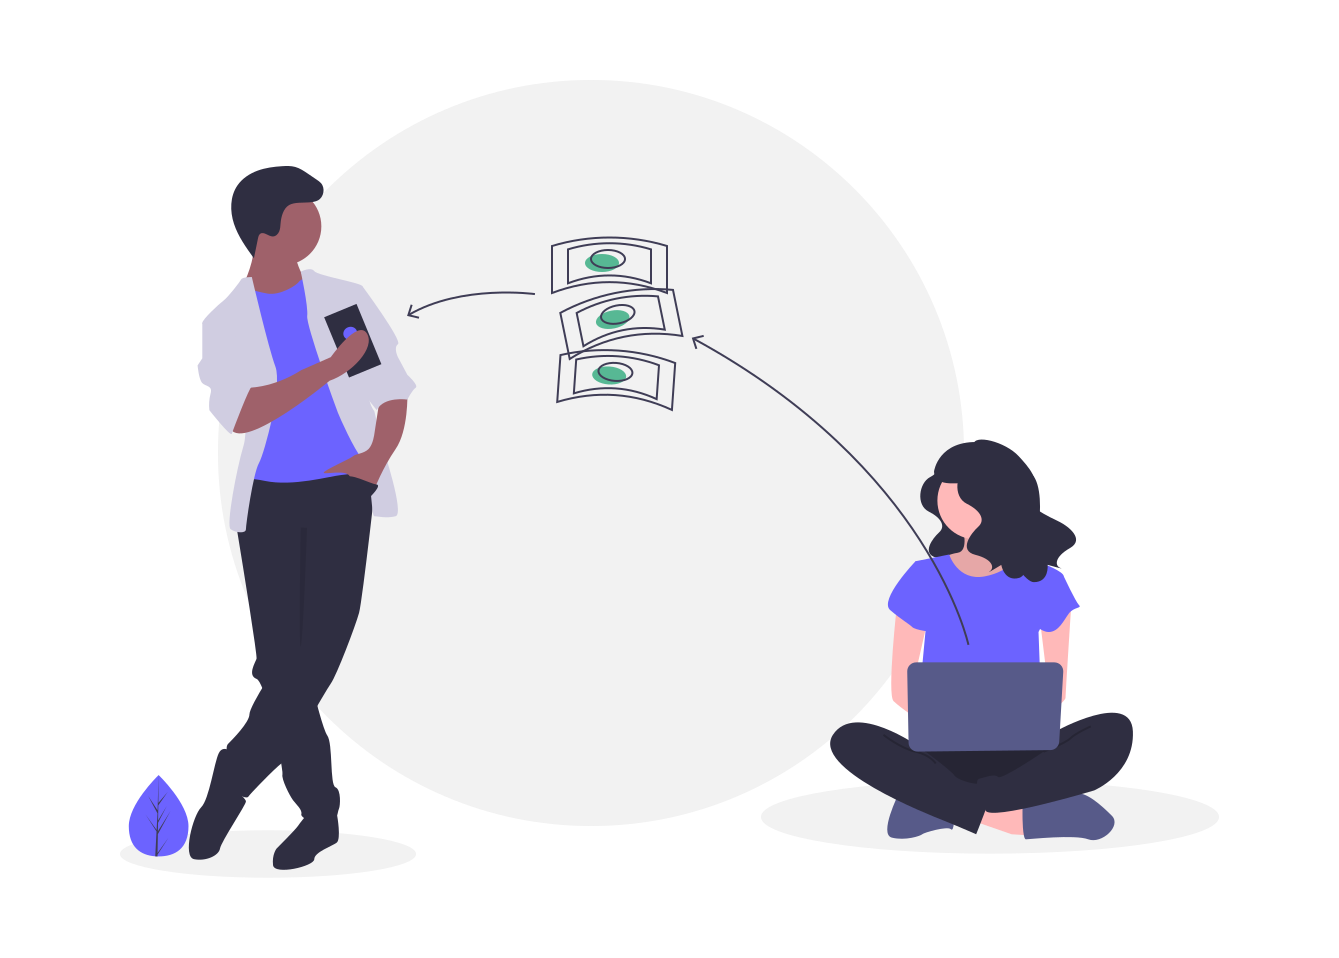 peer to peer lending transaction